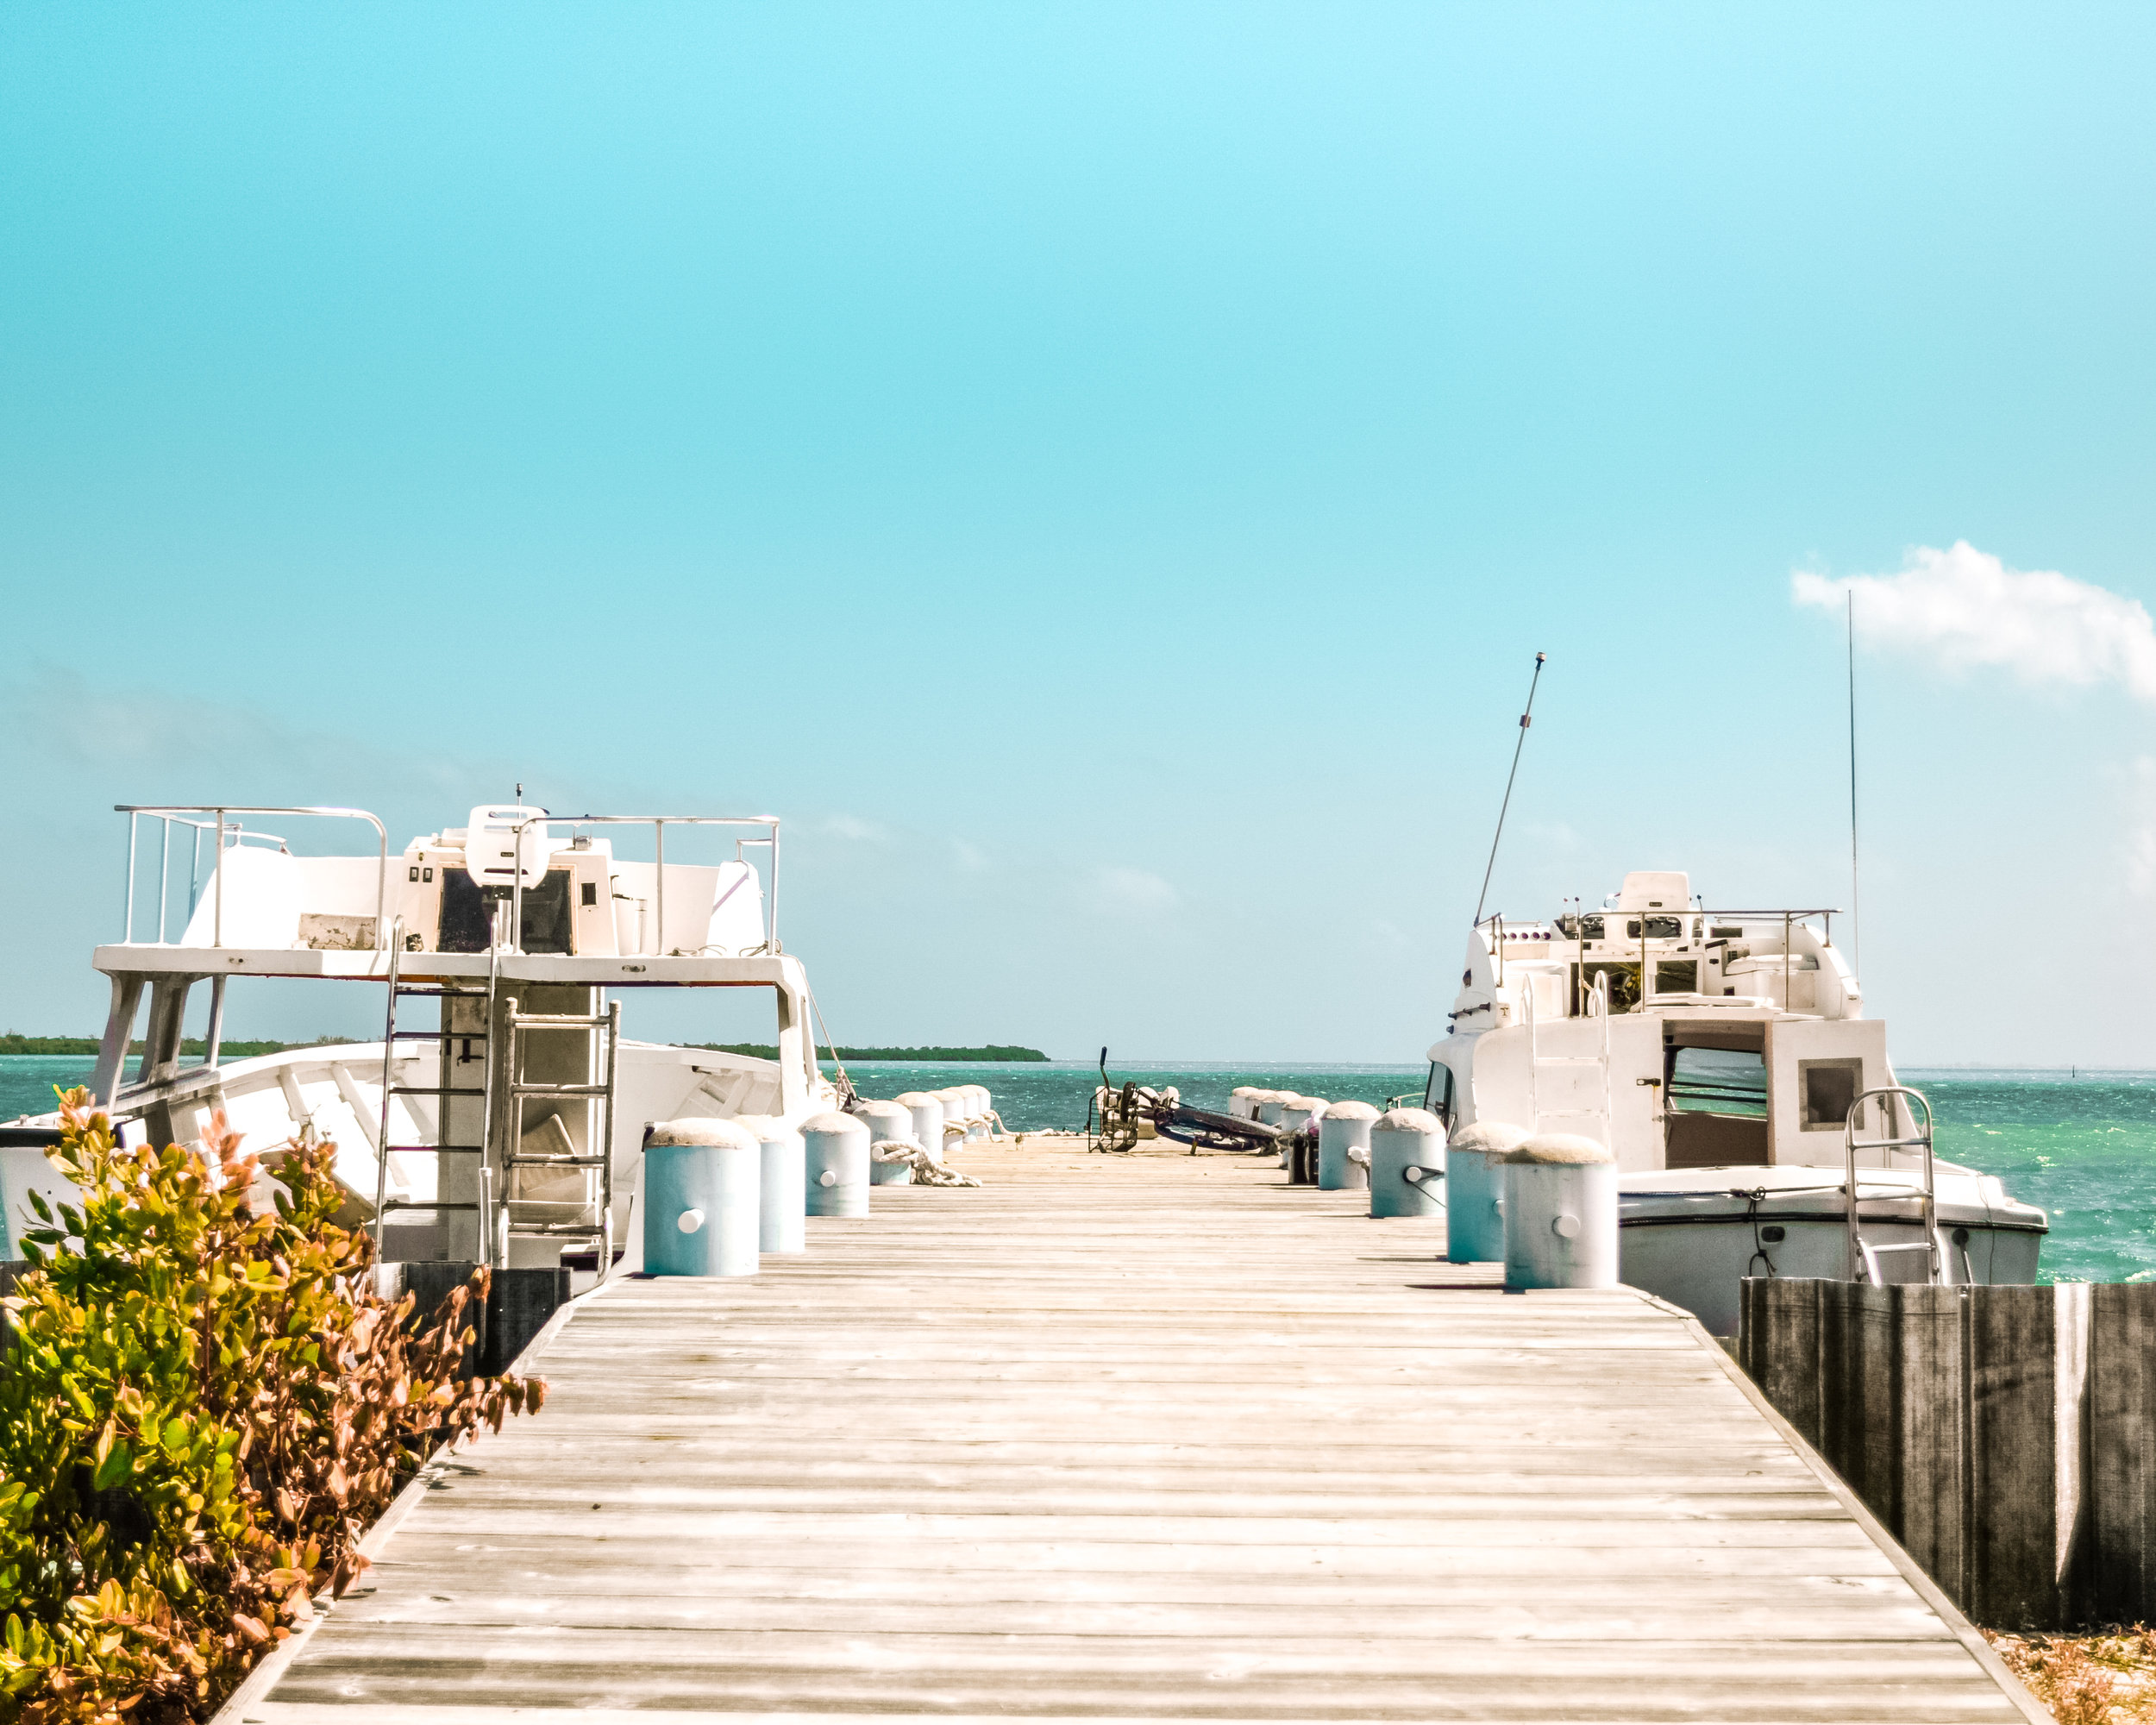 Cayman-01-13.jpg